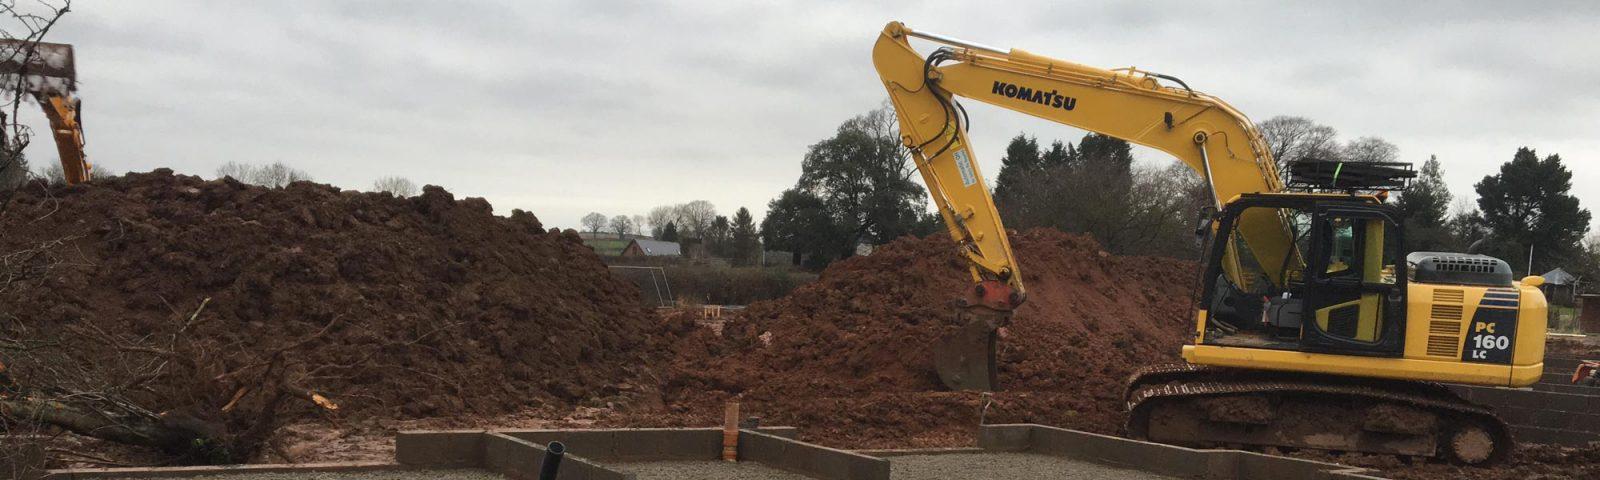 Komatsu Digger - Plant and Operator Hire